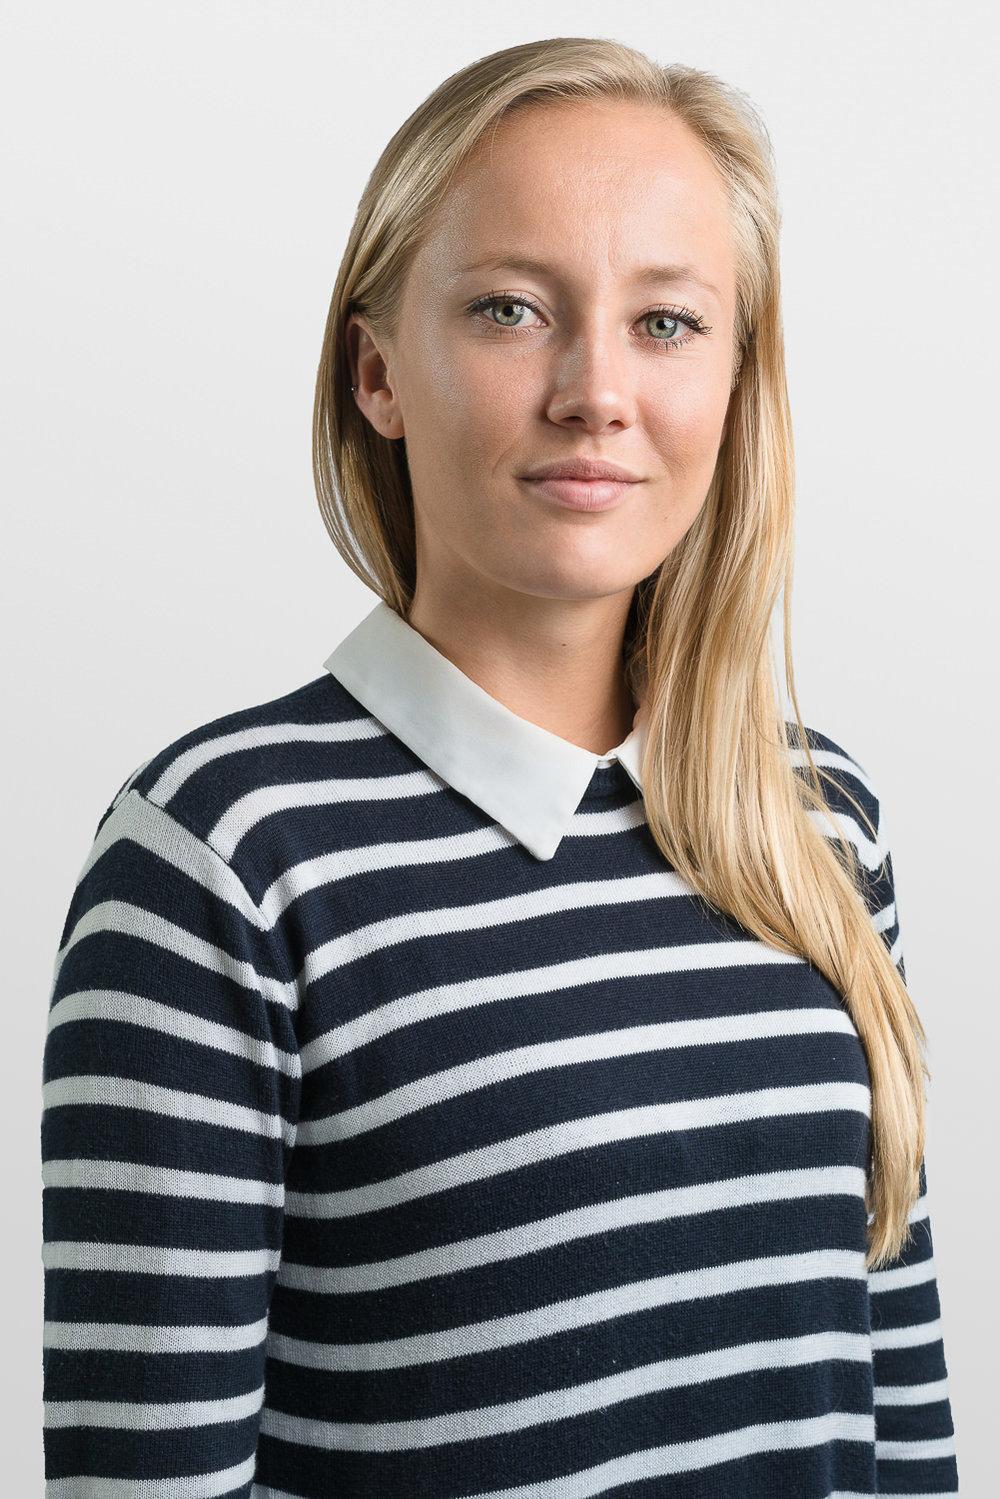 mark-hadden-amsterdam-london-business-headshots-zakelijk-portret-Linda-014.jpg